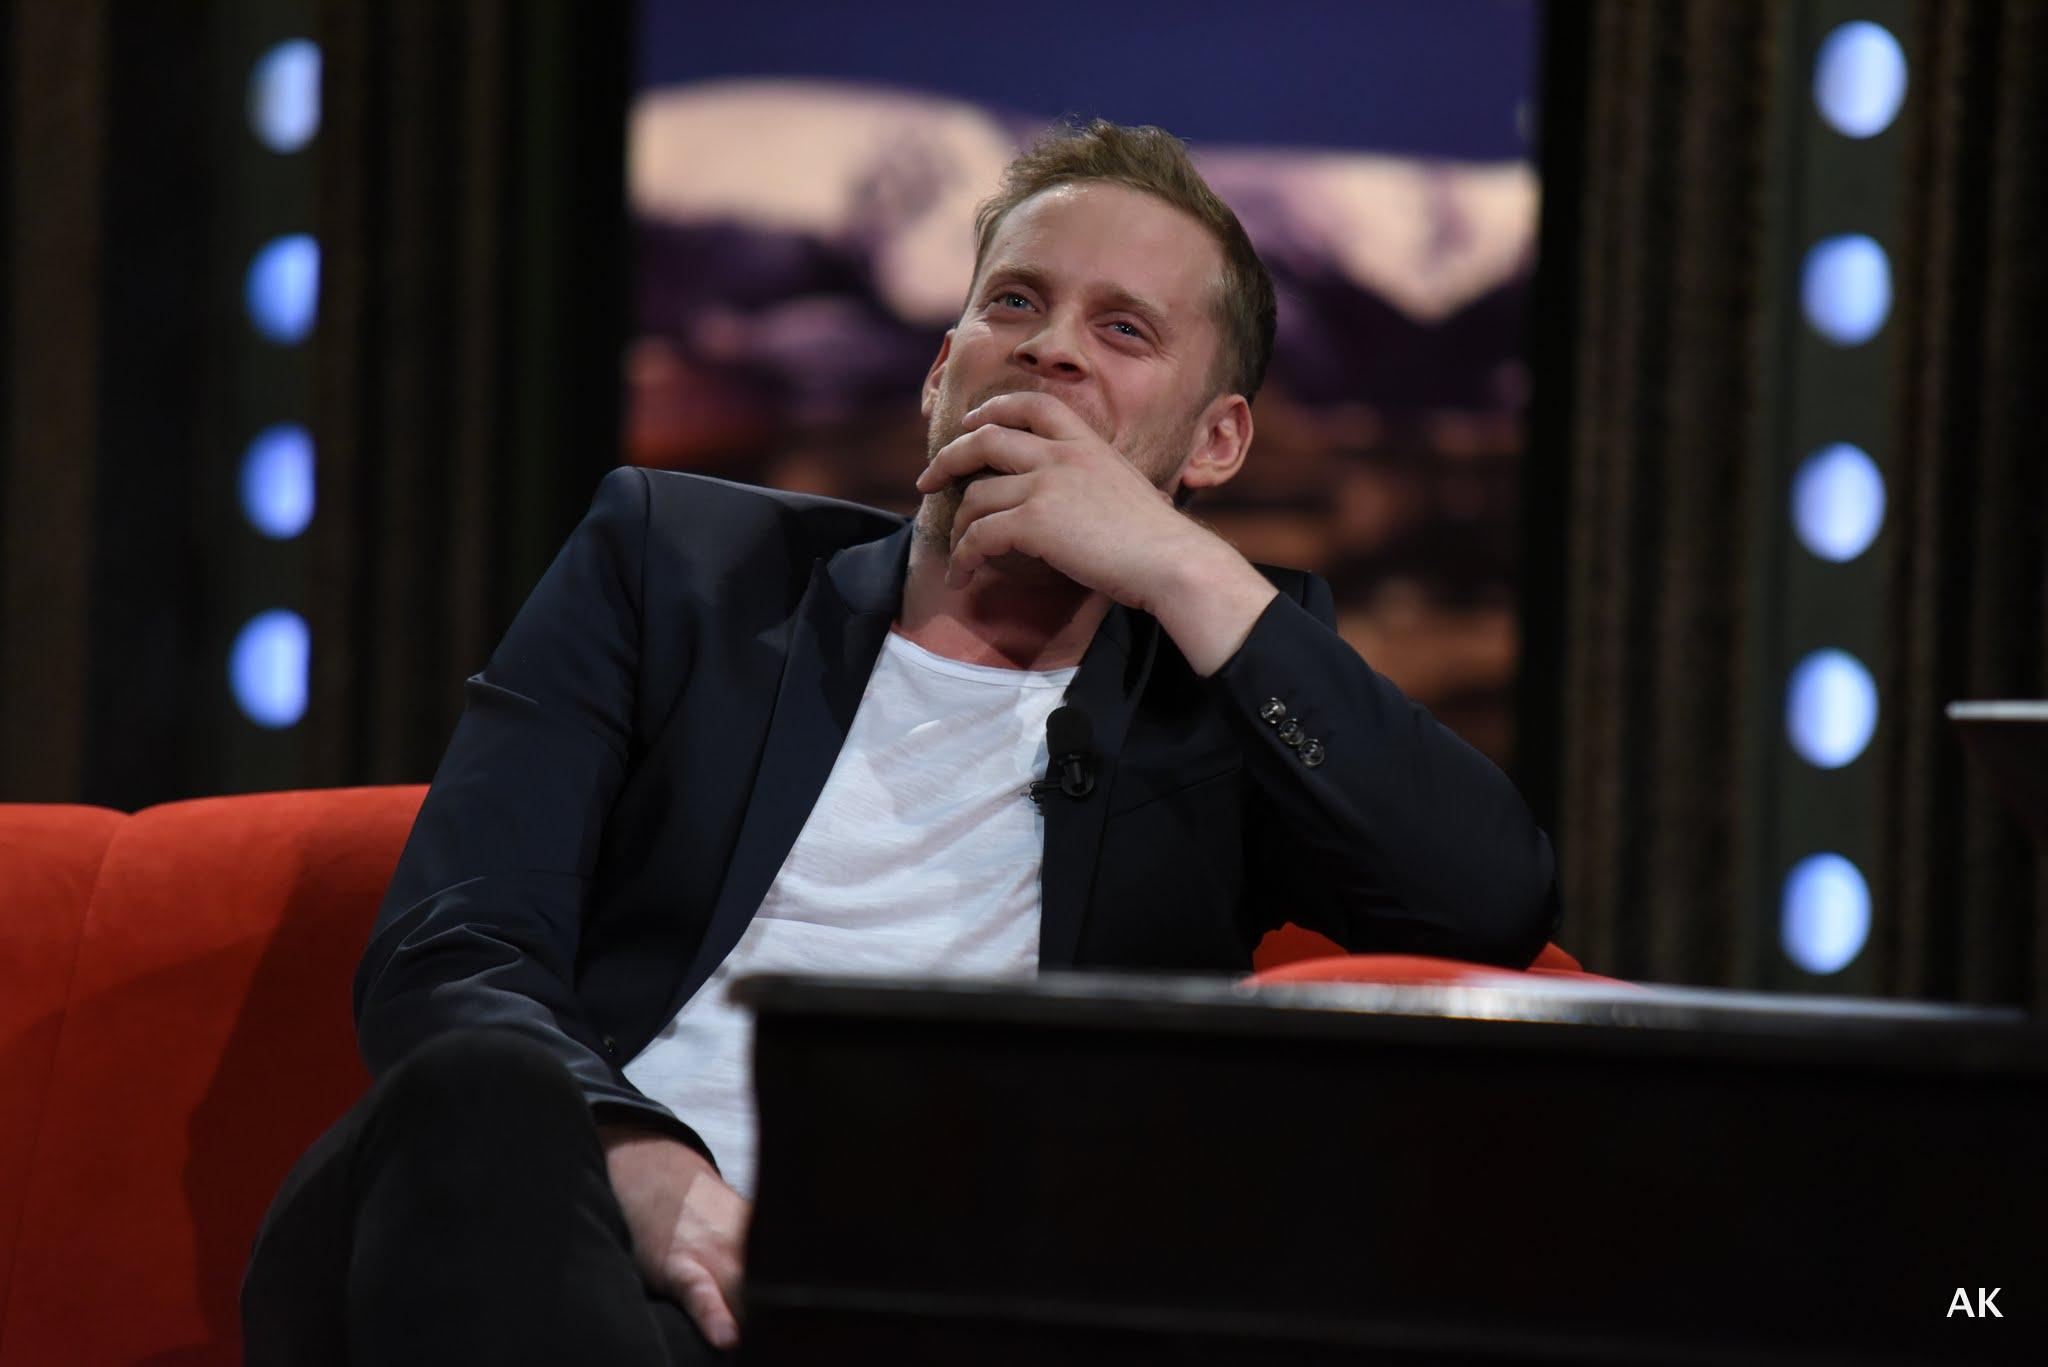 Herec a muzikant Jakub Prachař v SJK 20. 4. 2016